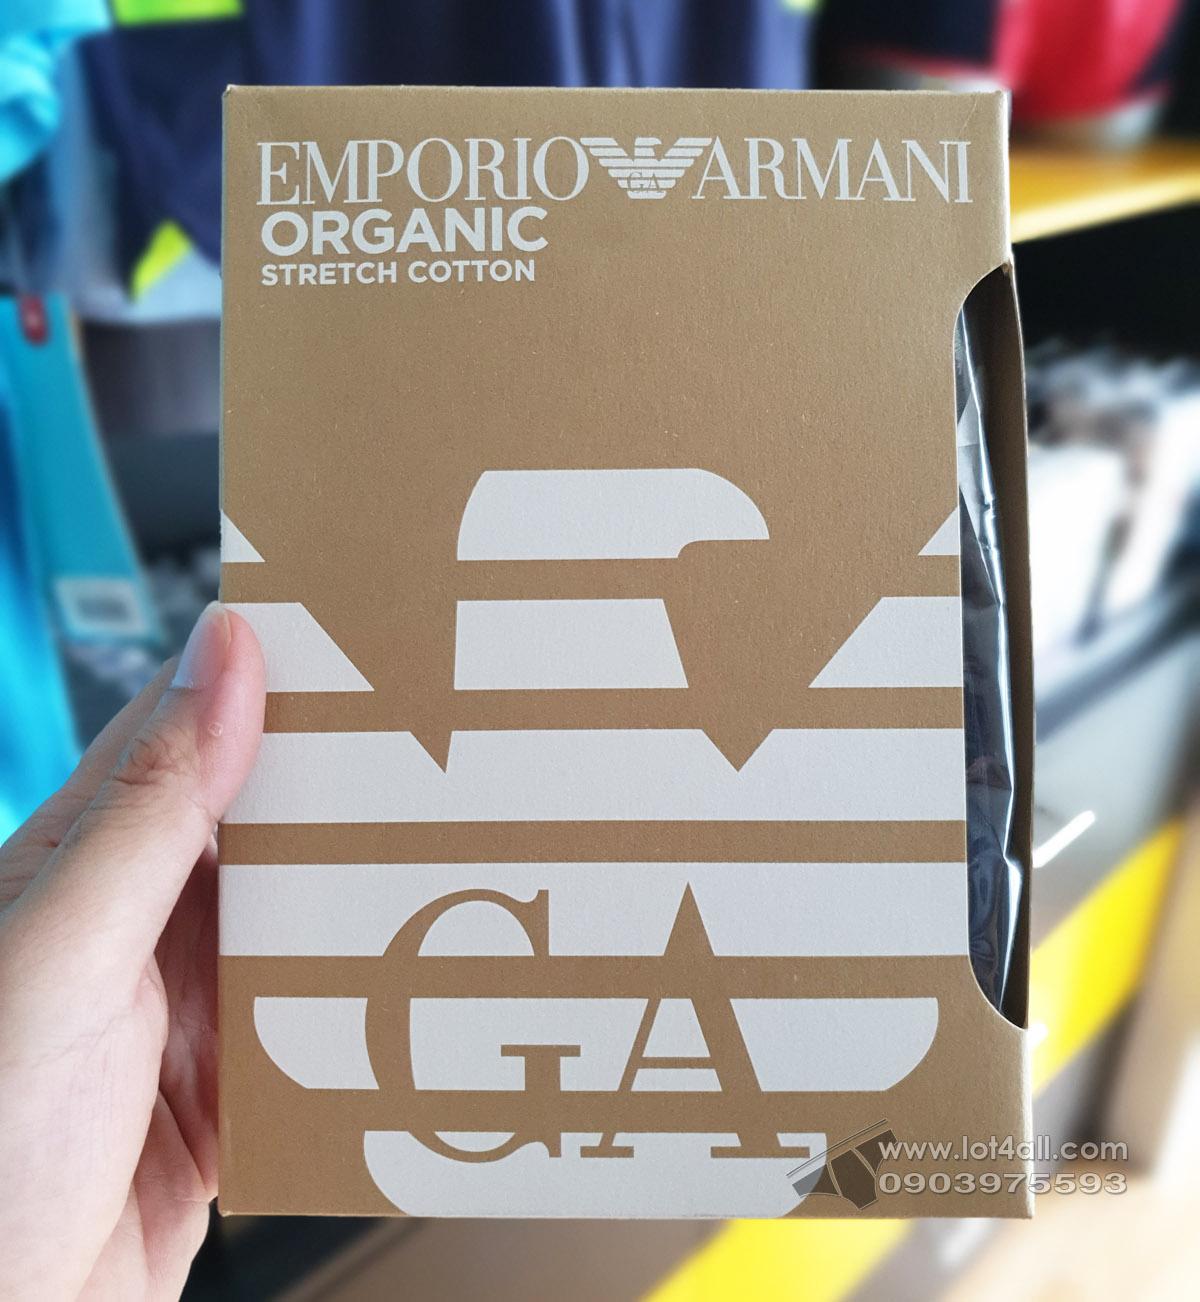 Quần lót nam Emporio Armani Organic Stretch Cotton Trunk Black